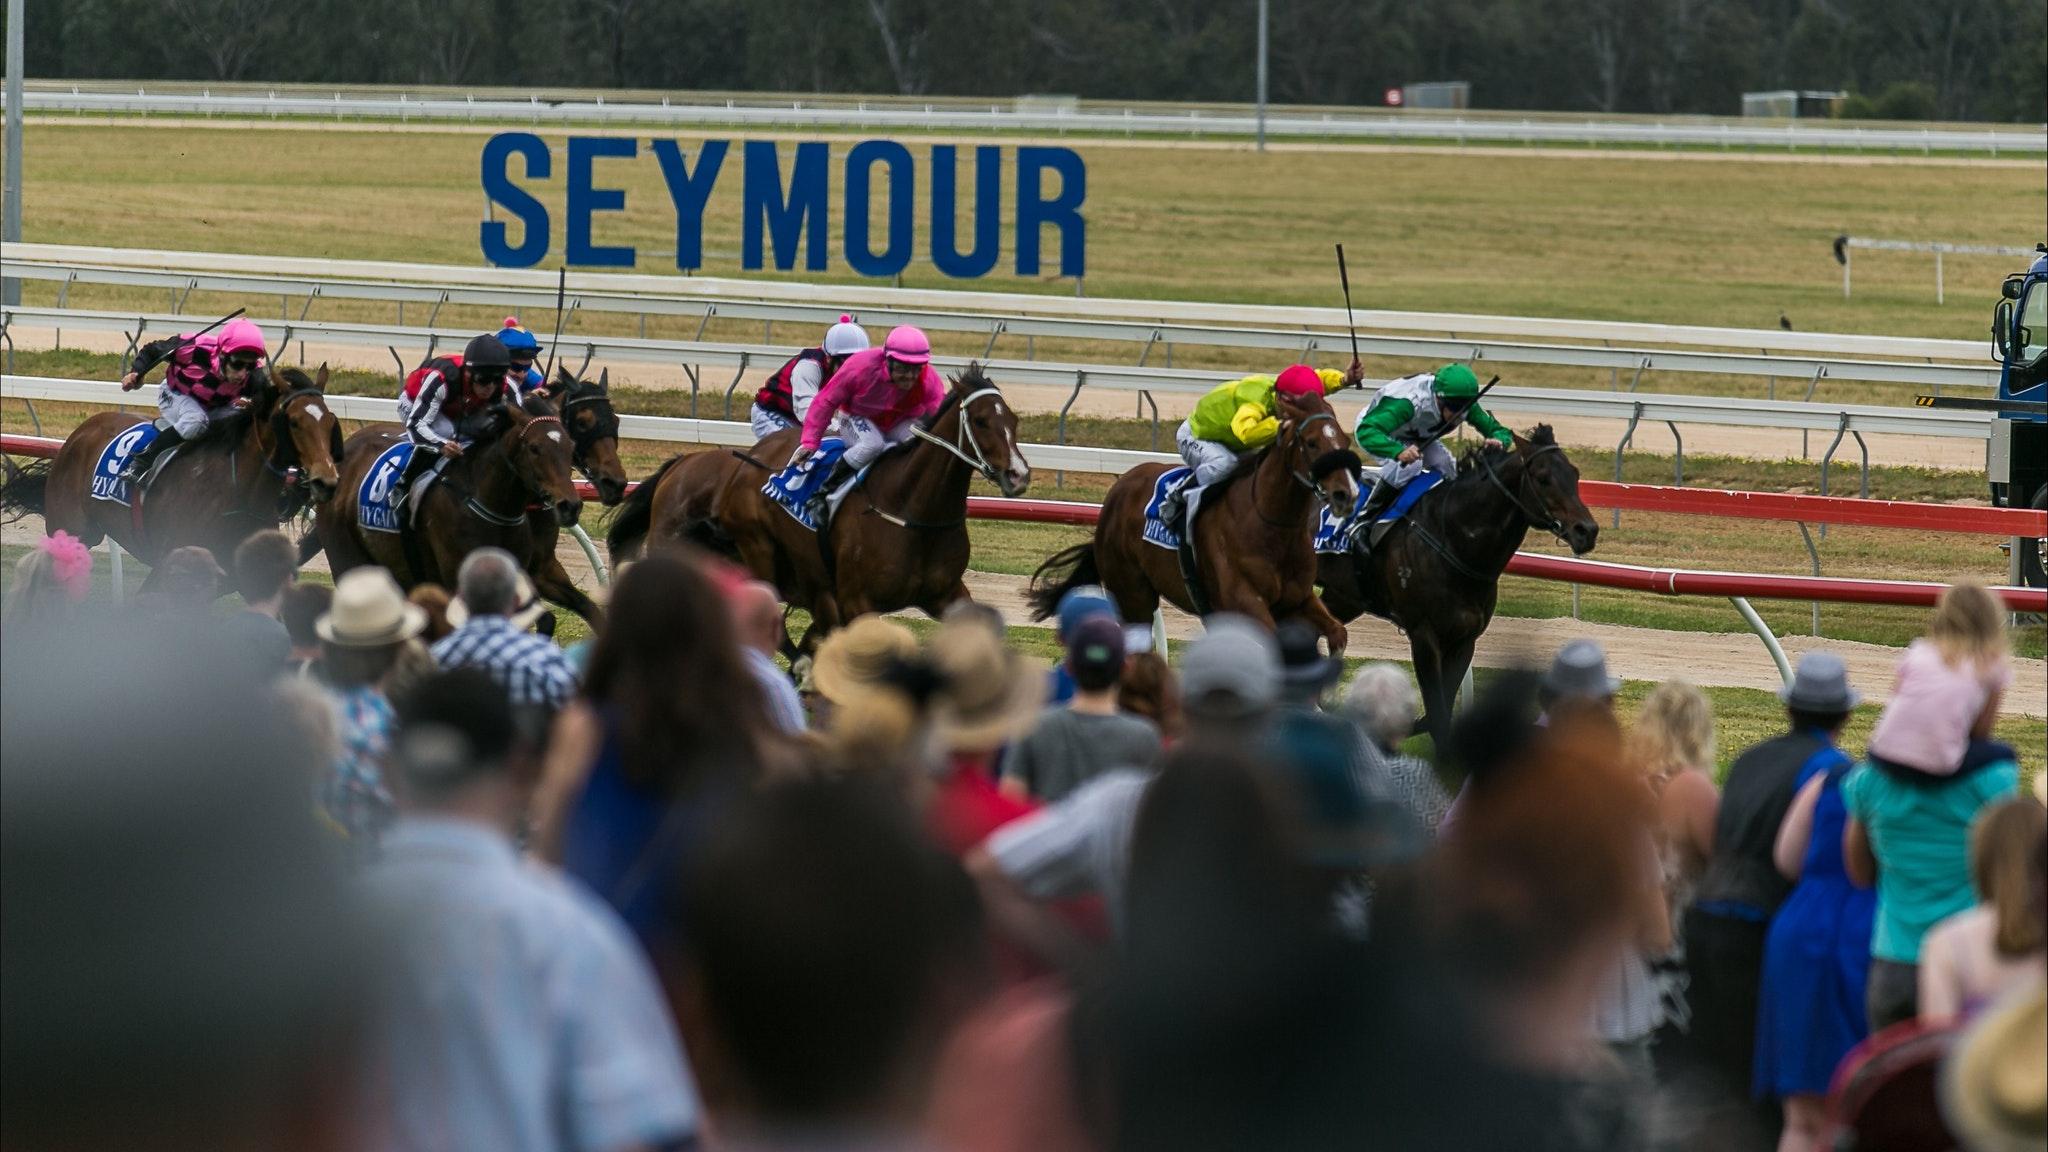 Seymour racing